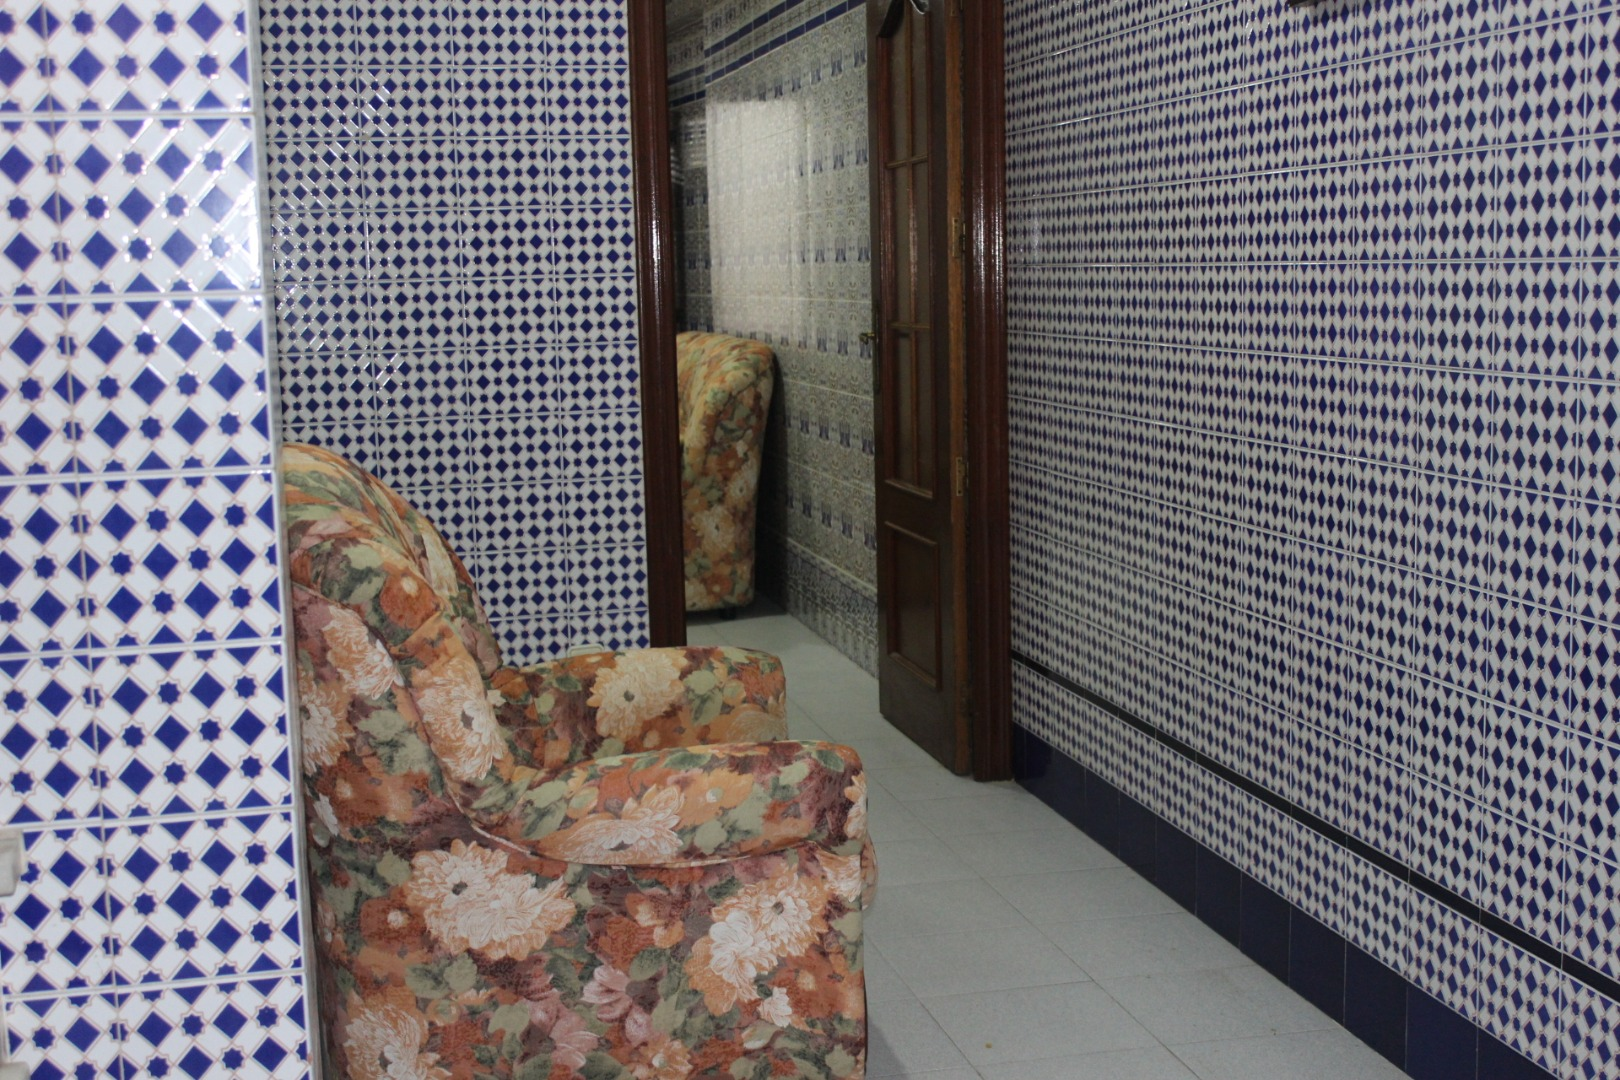 Lloguer Casa  Elche ciudad - el raval - portes encarnades